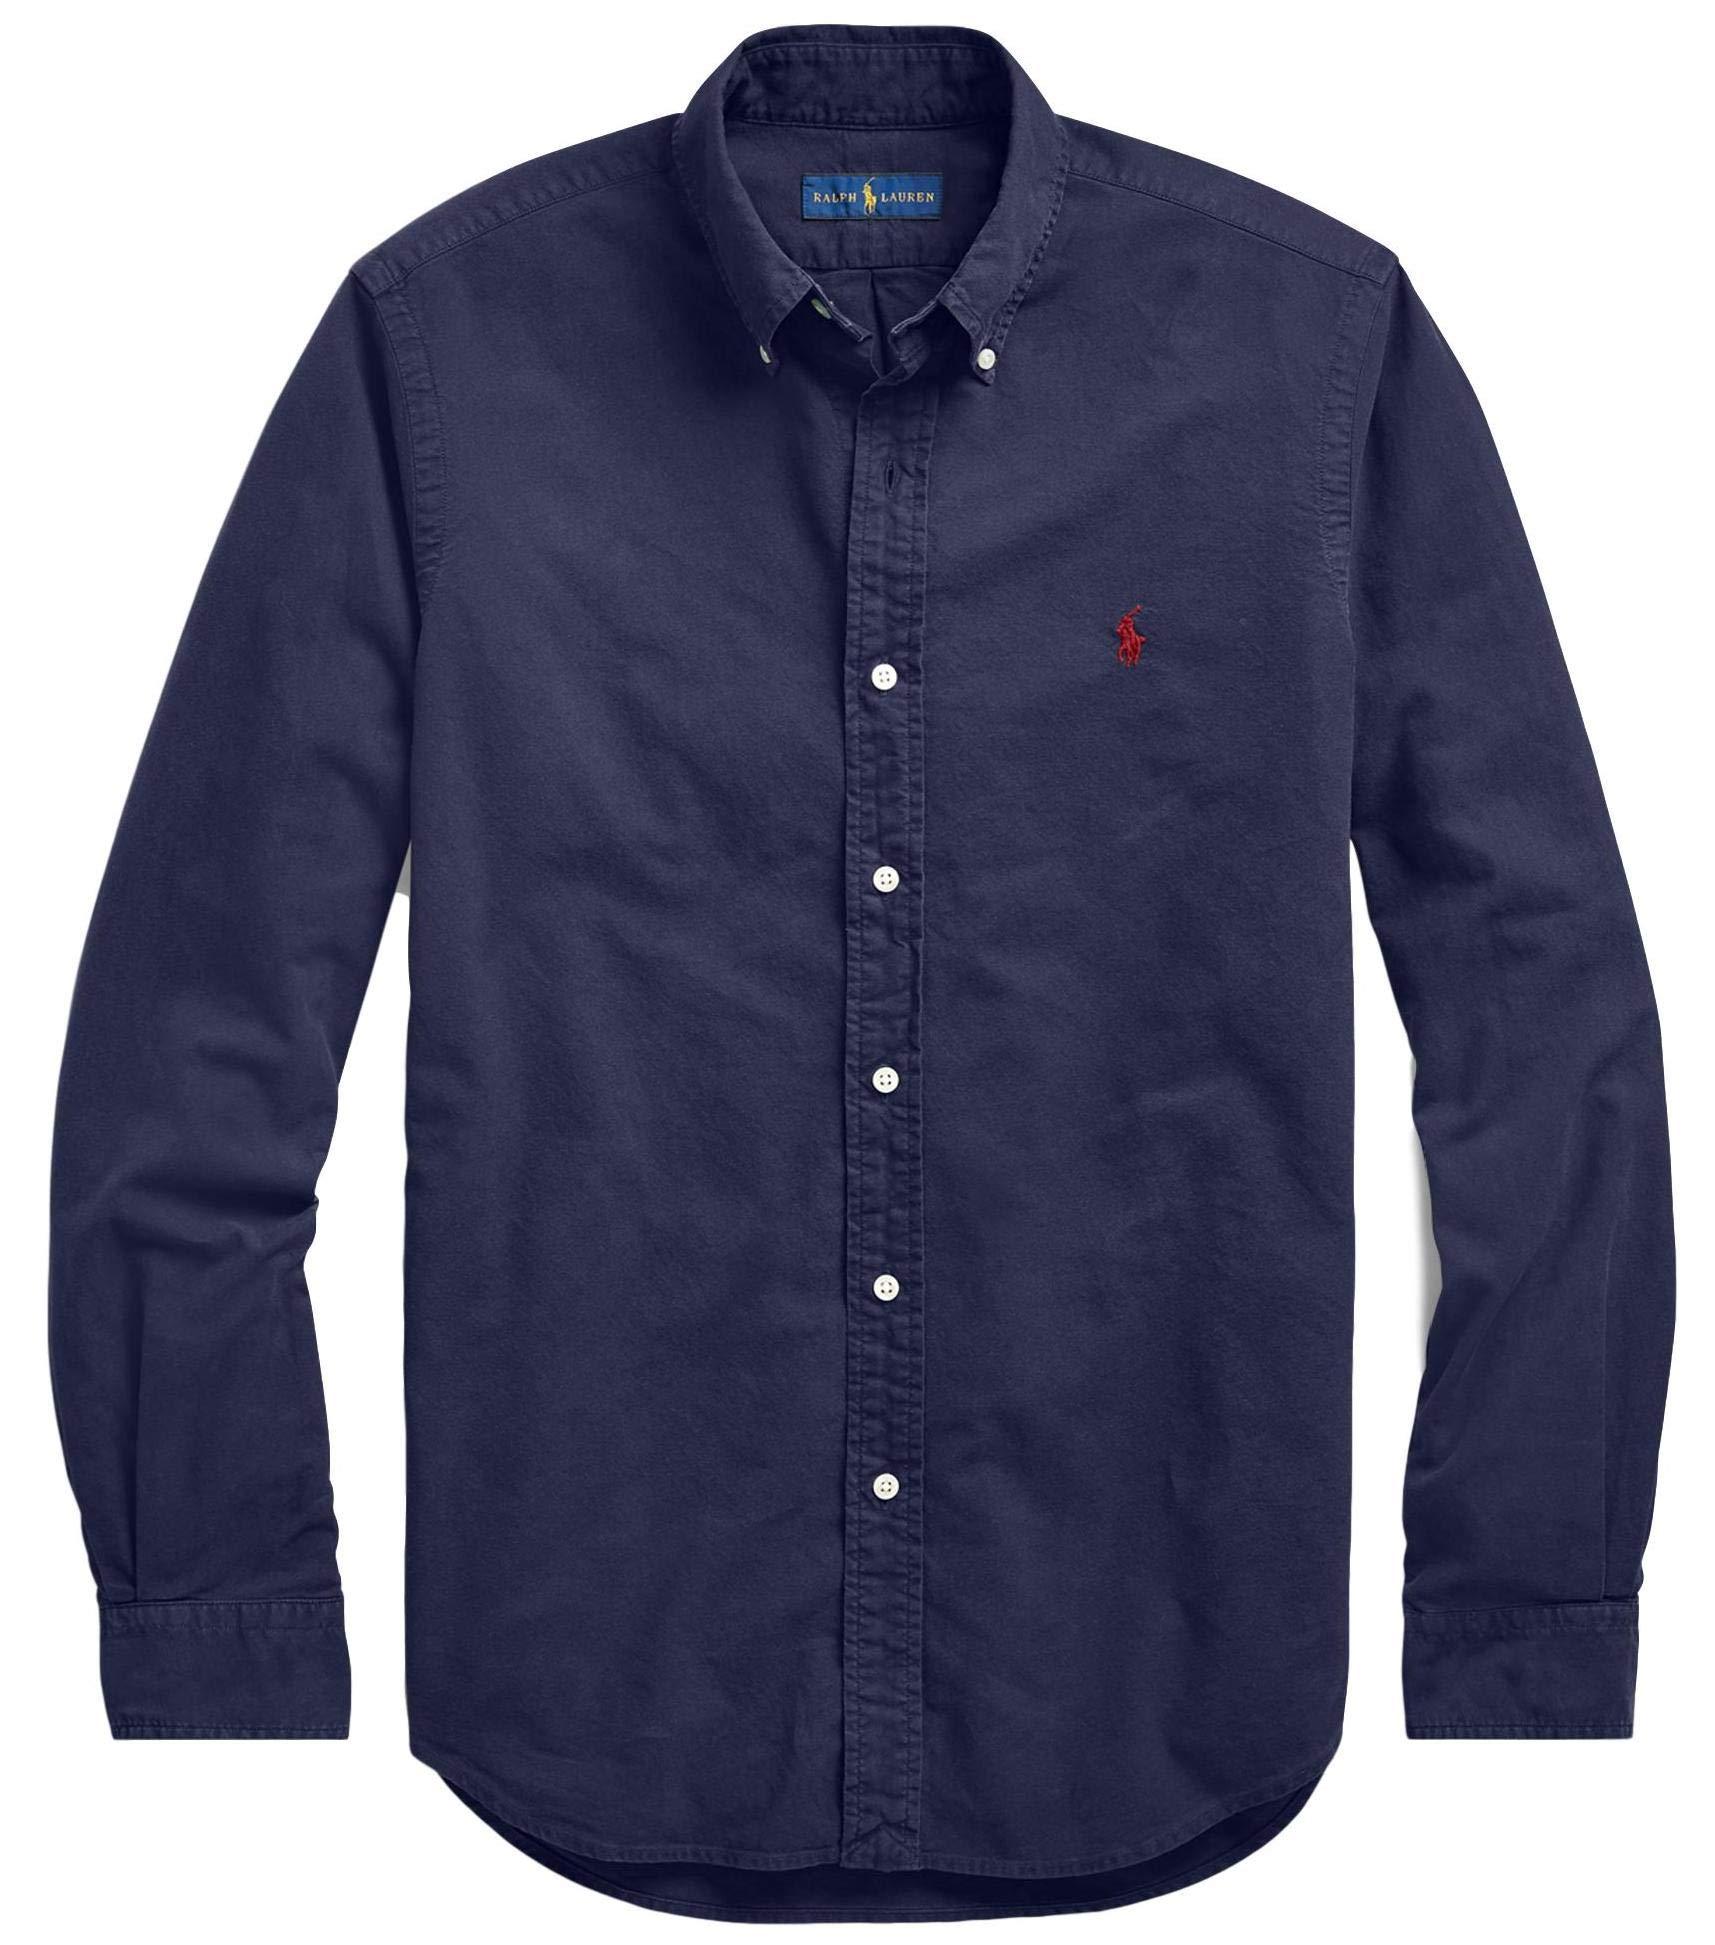 Polo Ralph Lauren Mens Stretch Oxford Slim Fit Sport Shirt, RLNavy M